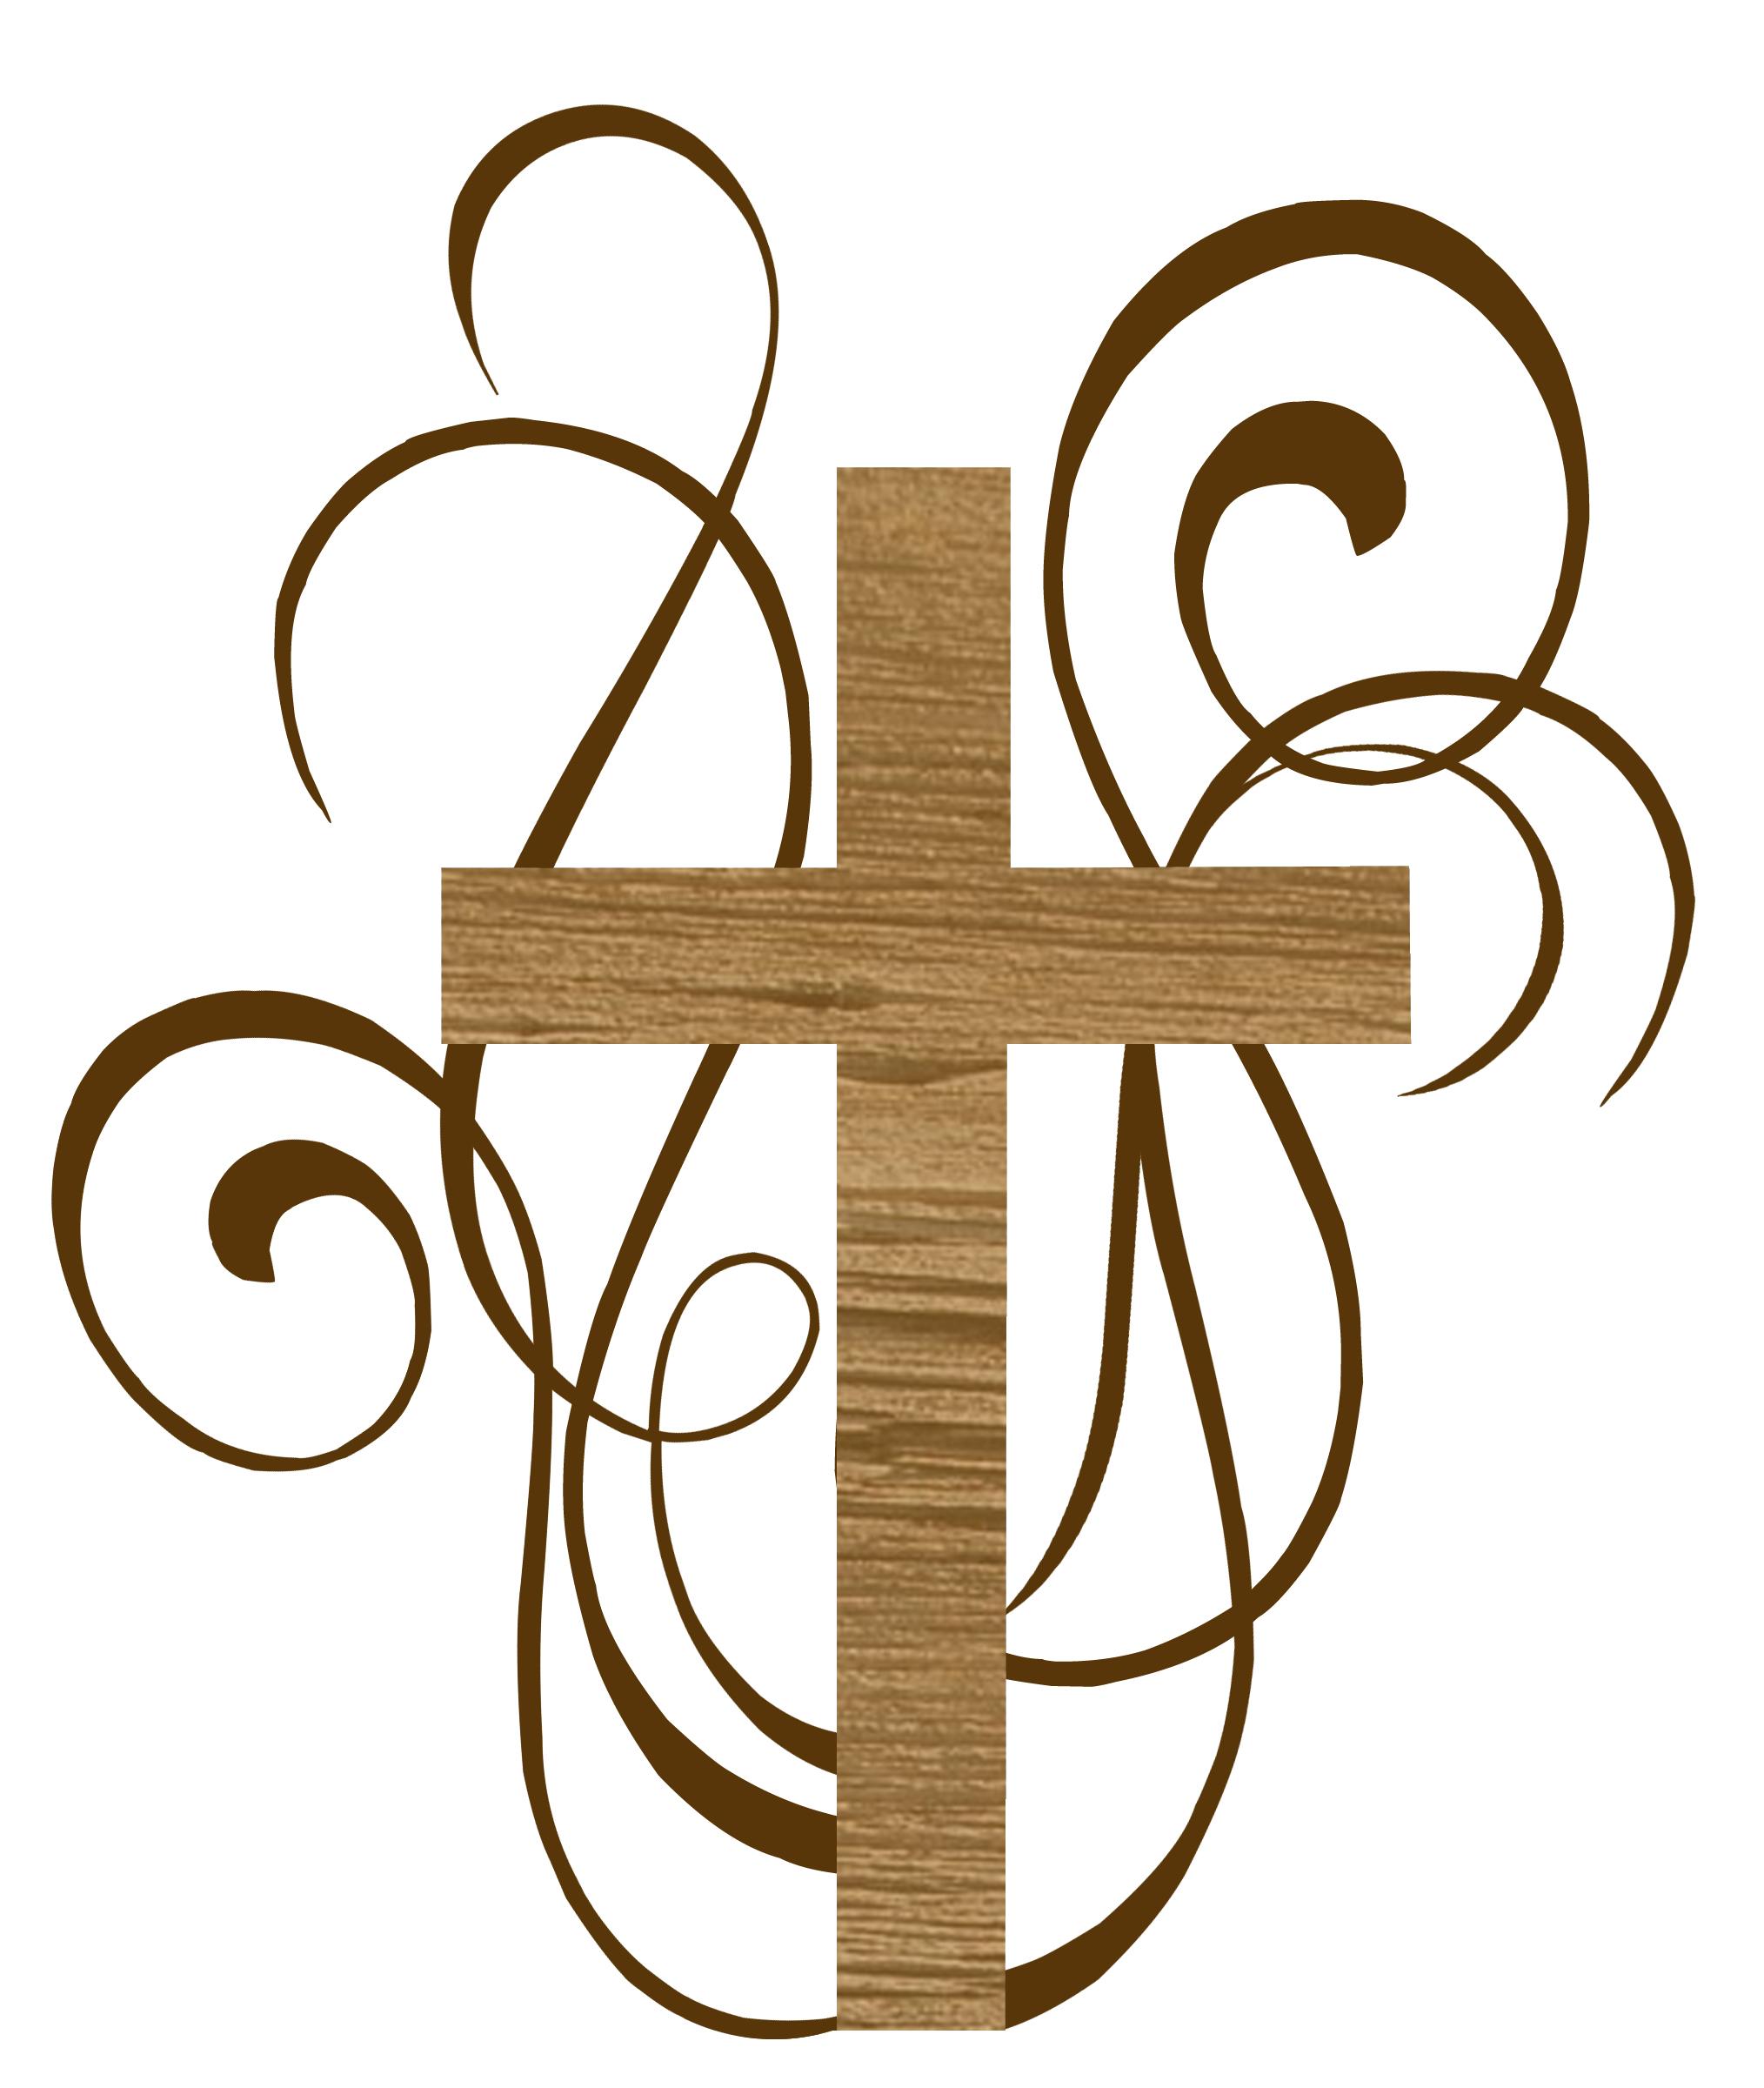 Catholic church symbols free download best catholic church 2028x2400 symbol clipart baptism biocorpaavc